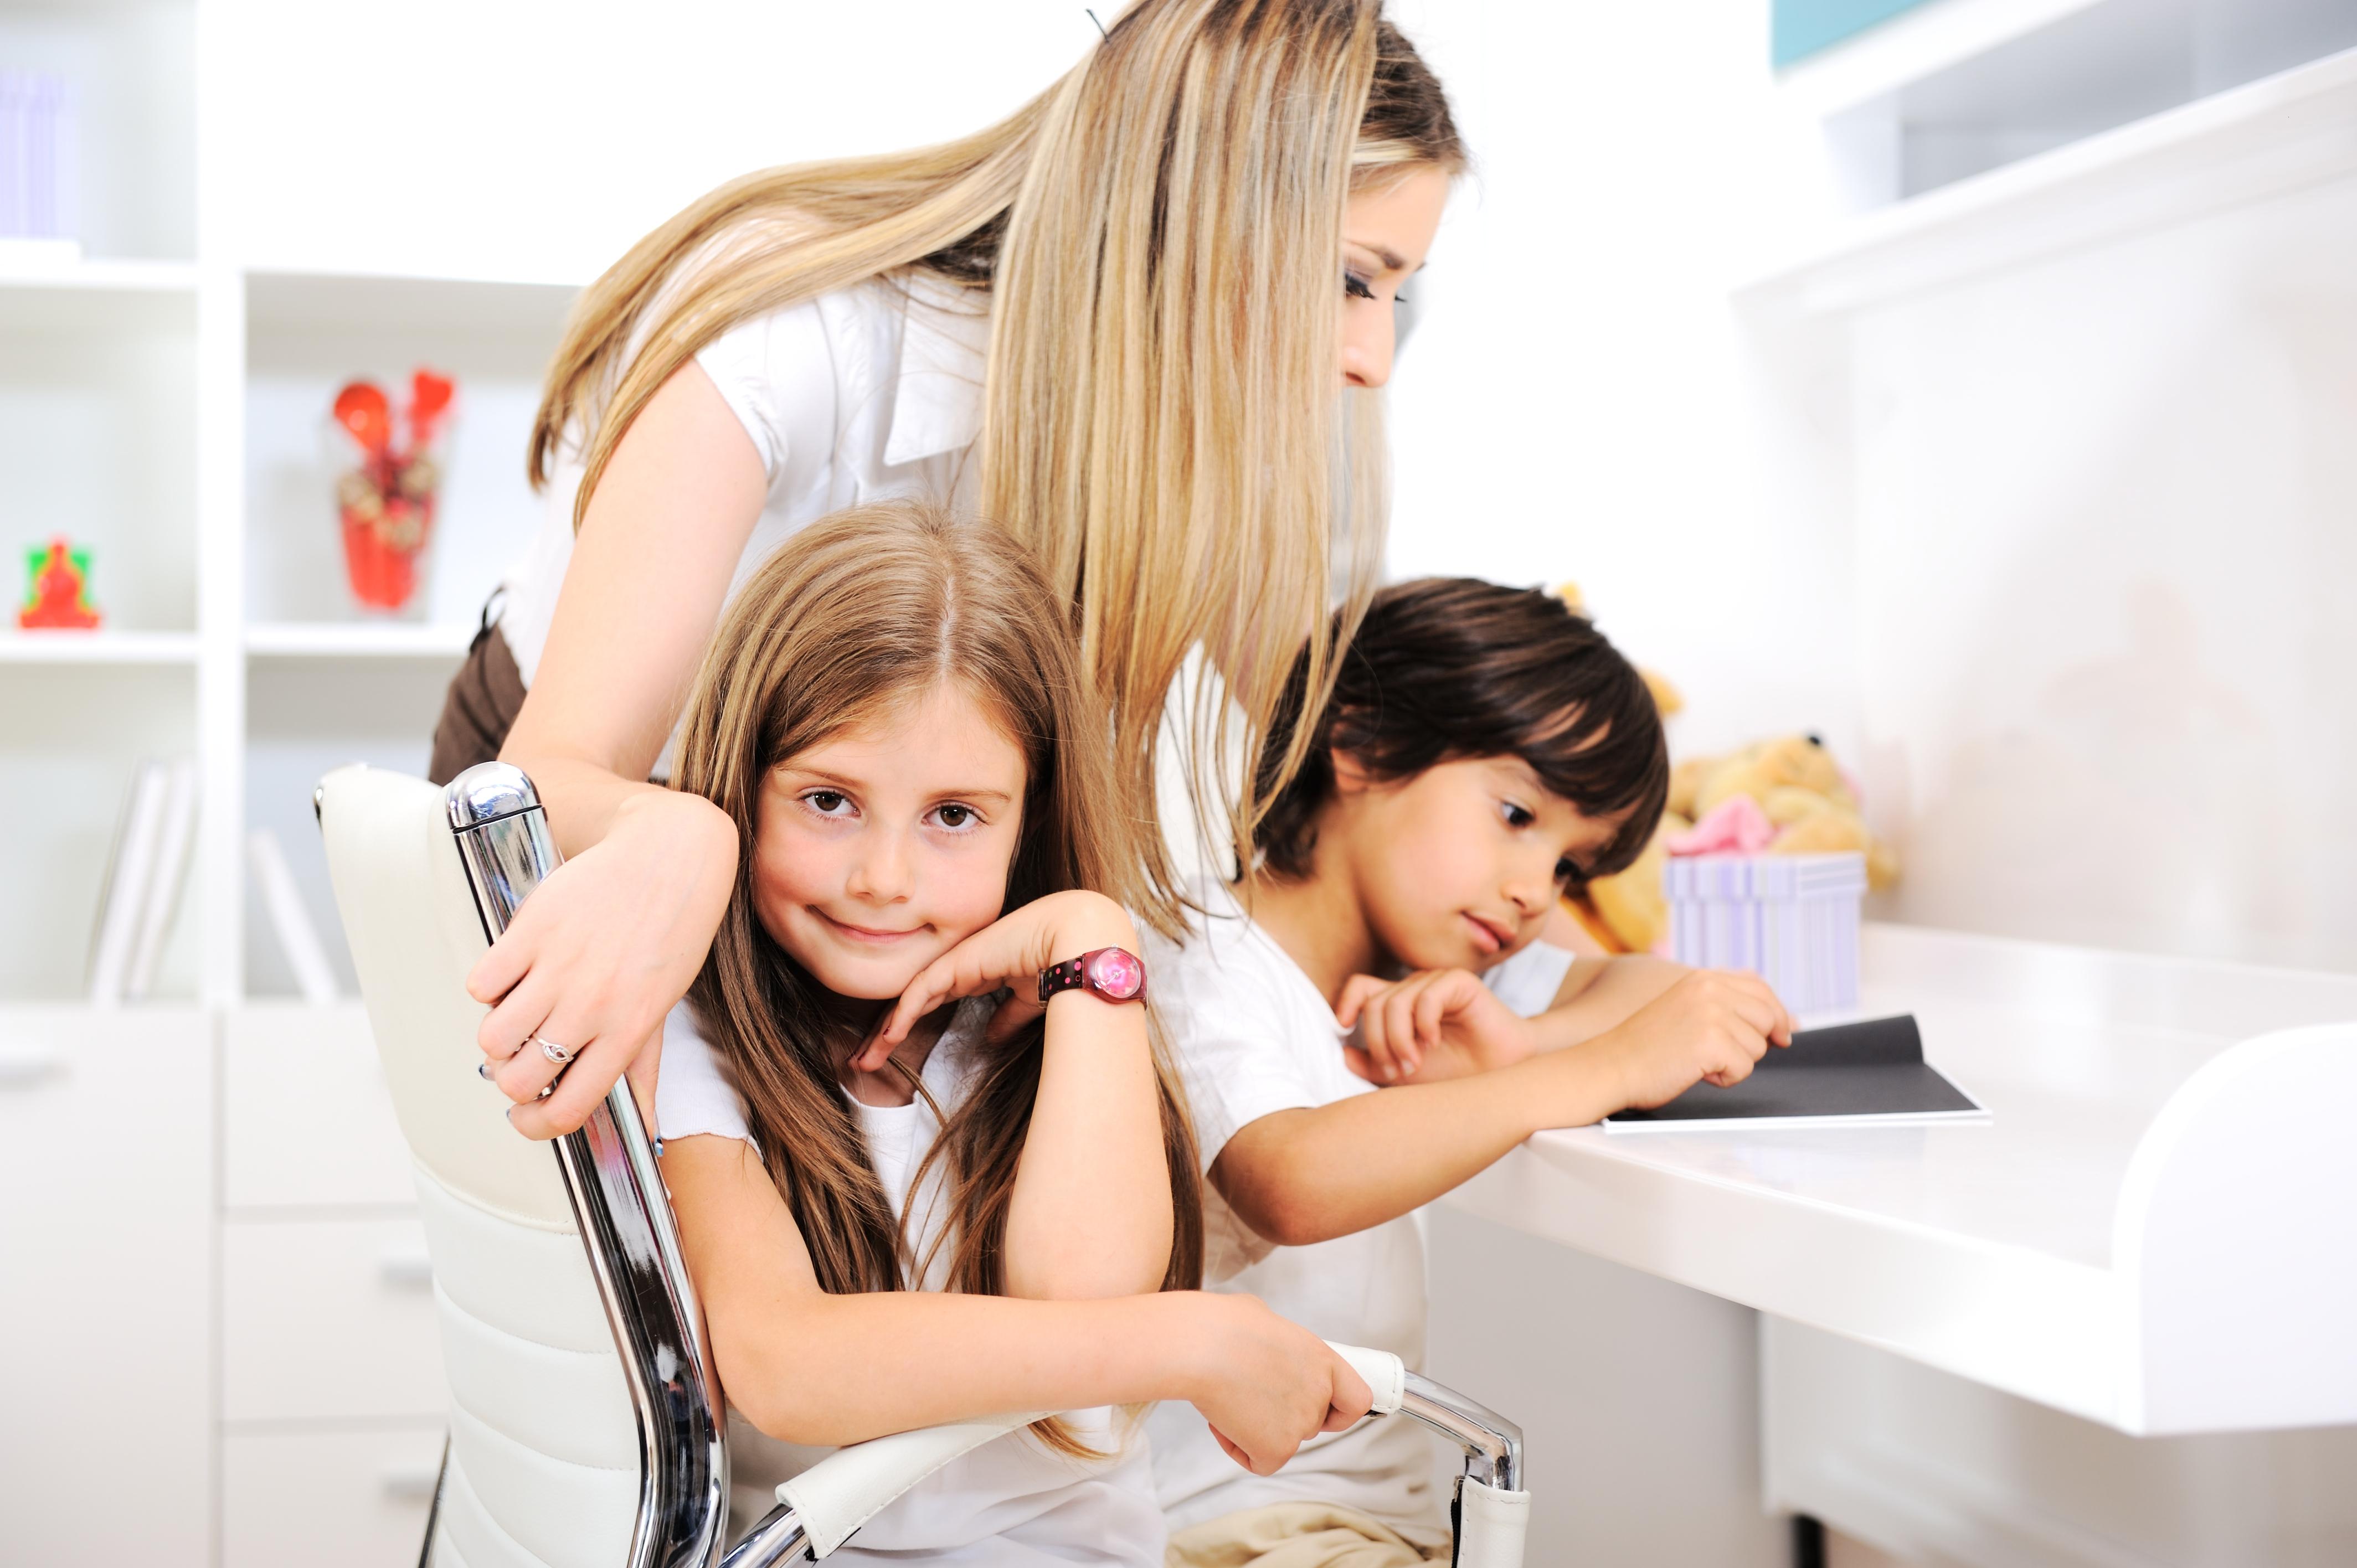 Fist time mom checklist - Congratulations, youre